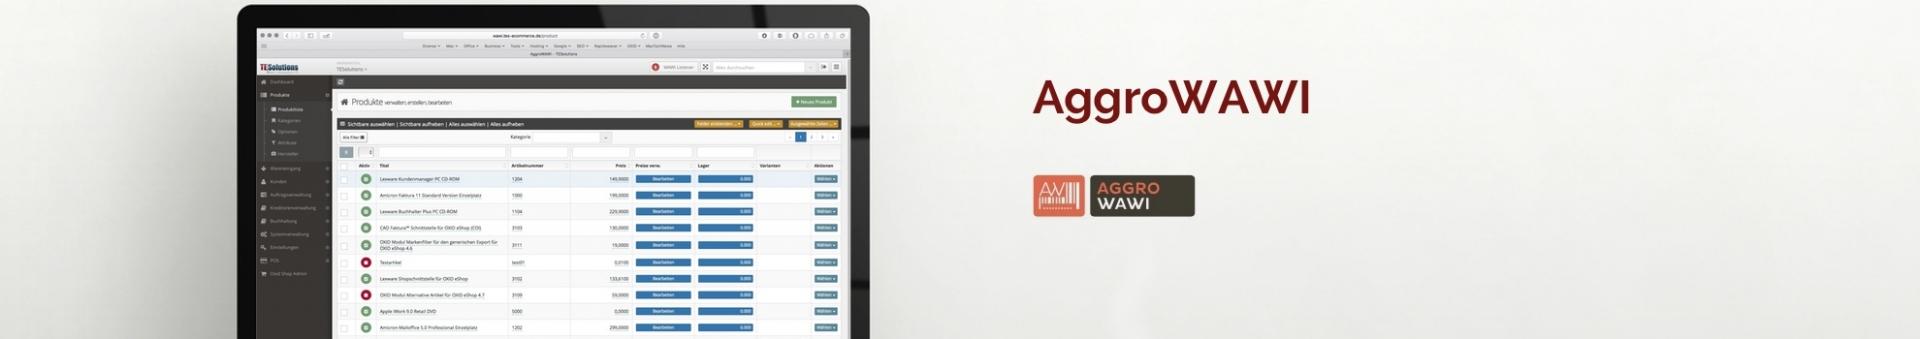 AggroWAWI